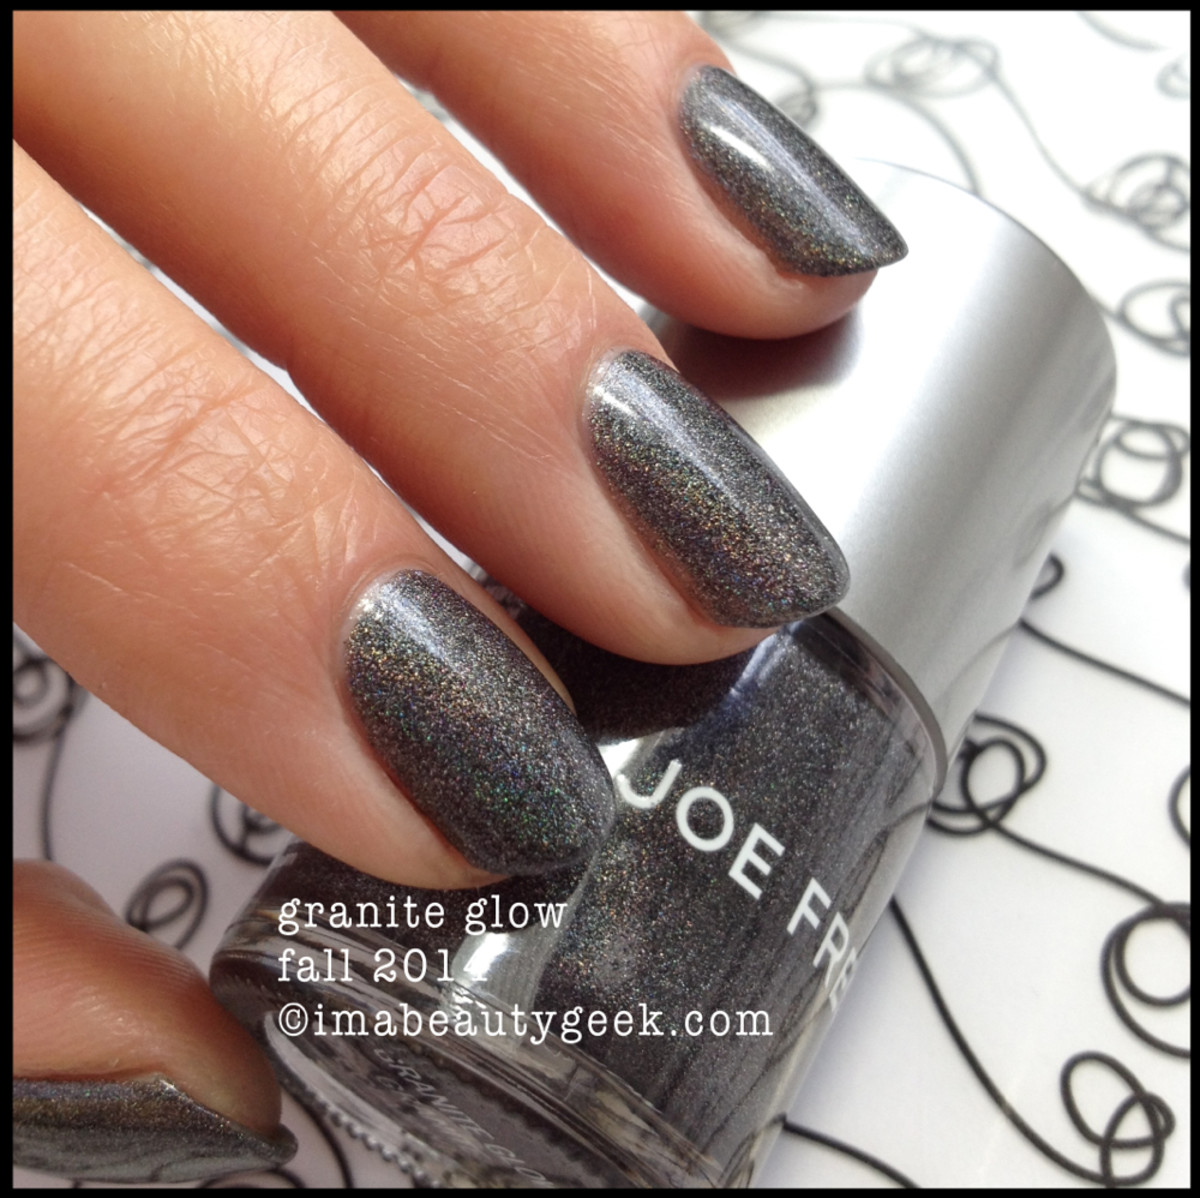 Joe Fresh Granite Glow Holo Fall 2014 Beautygeeks